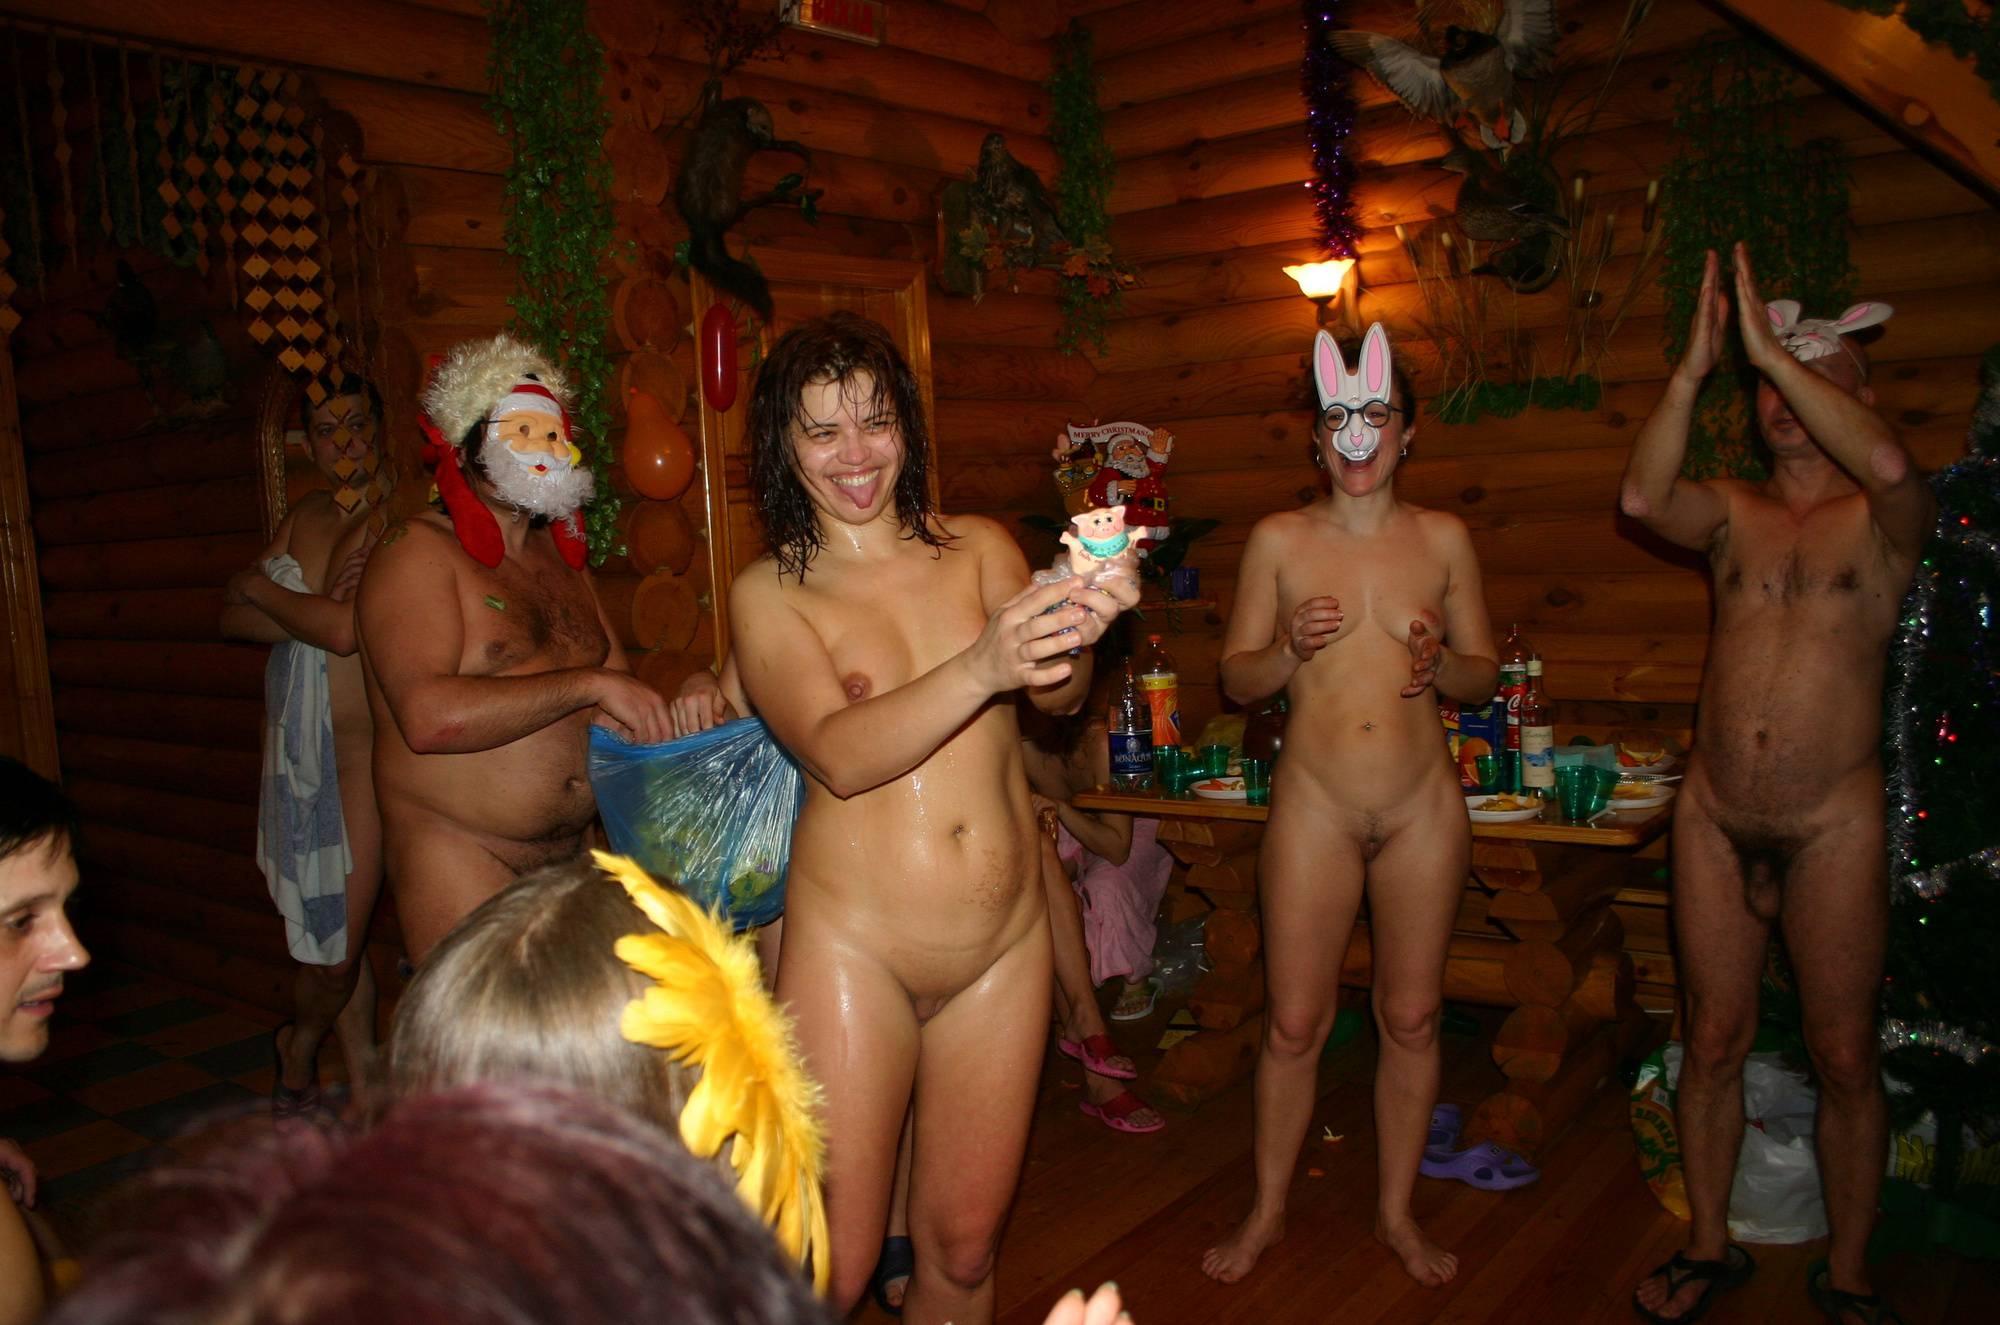 Purenudism Images Kiev Masquerade Huddle - 1